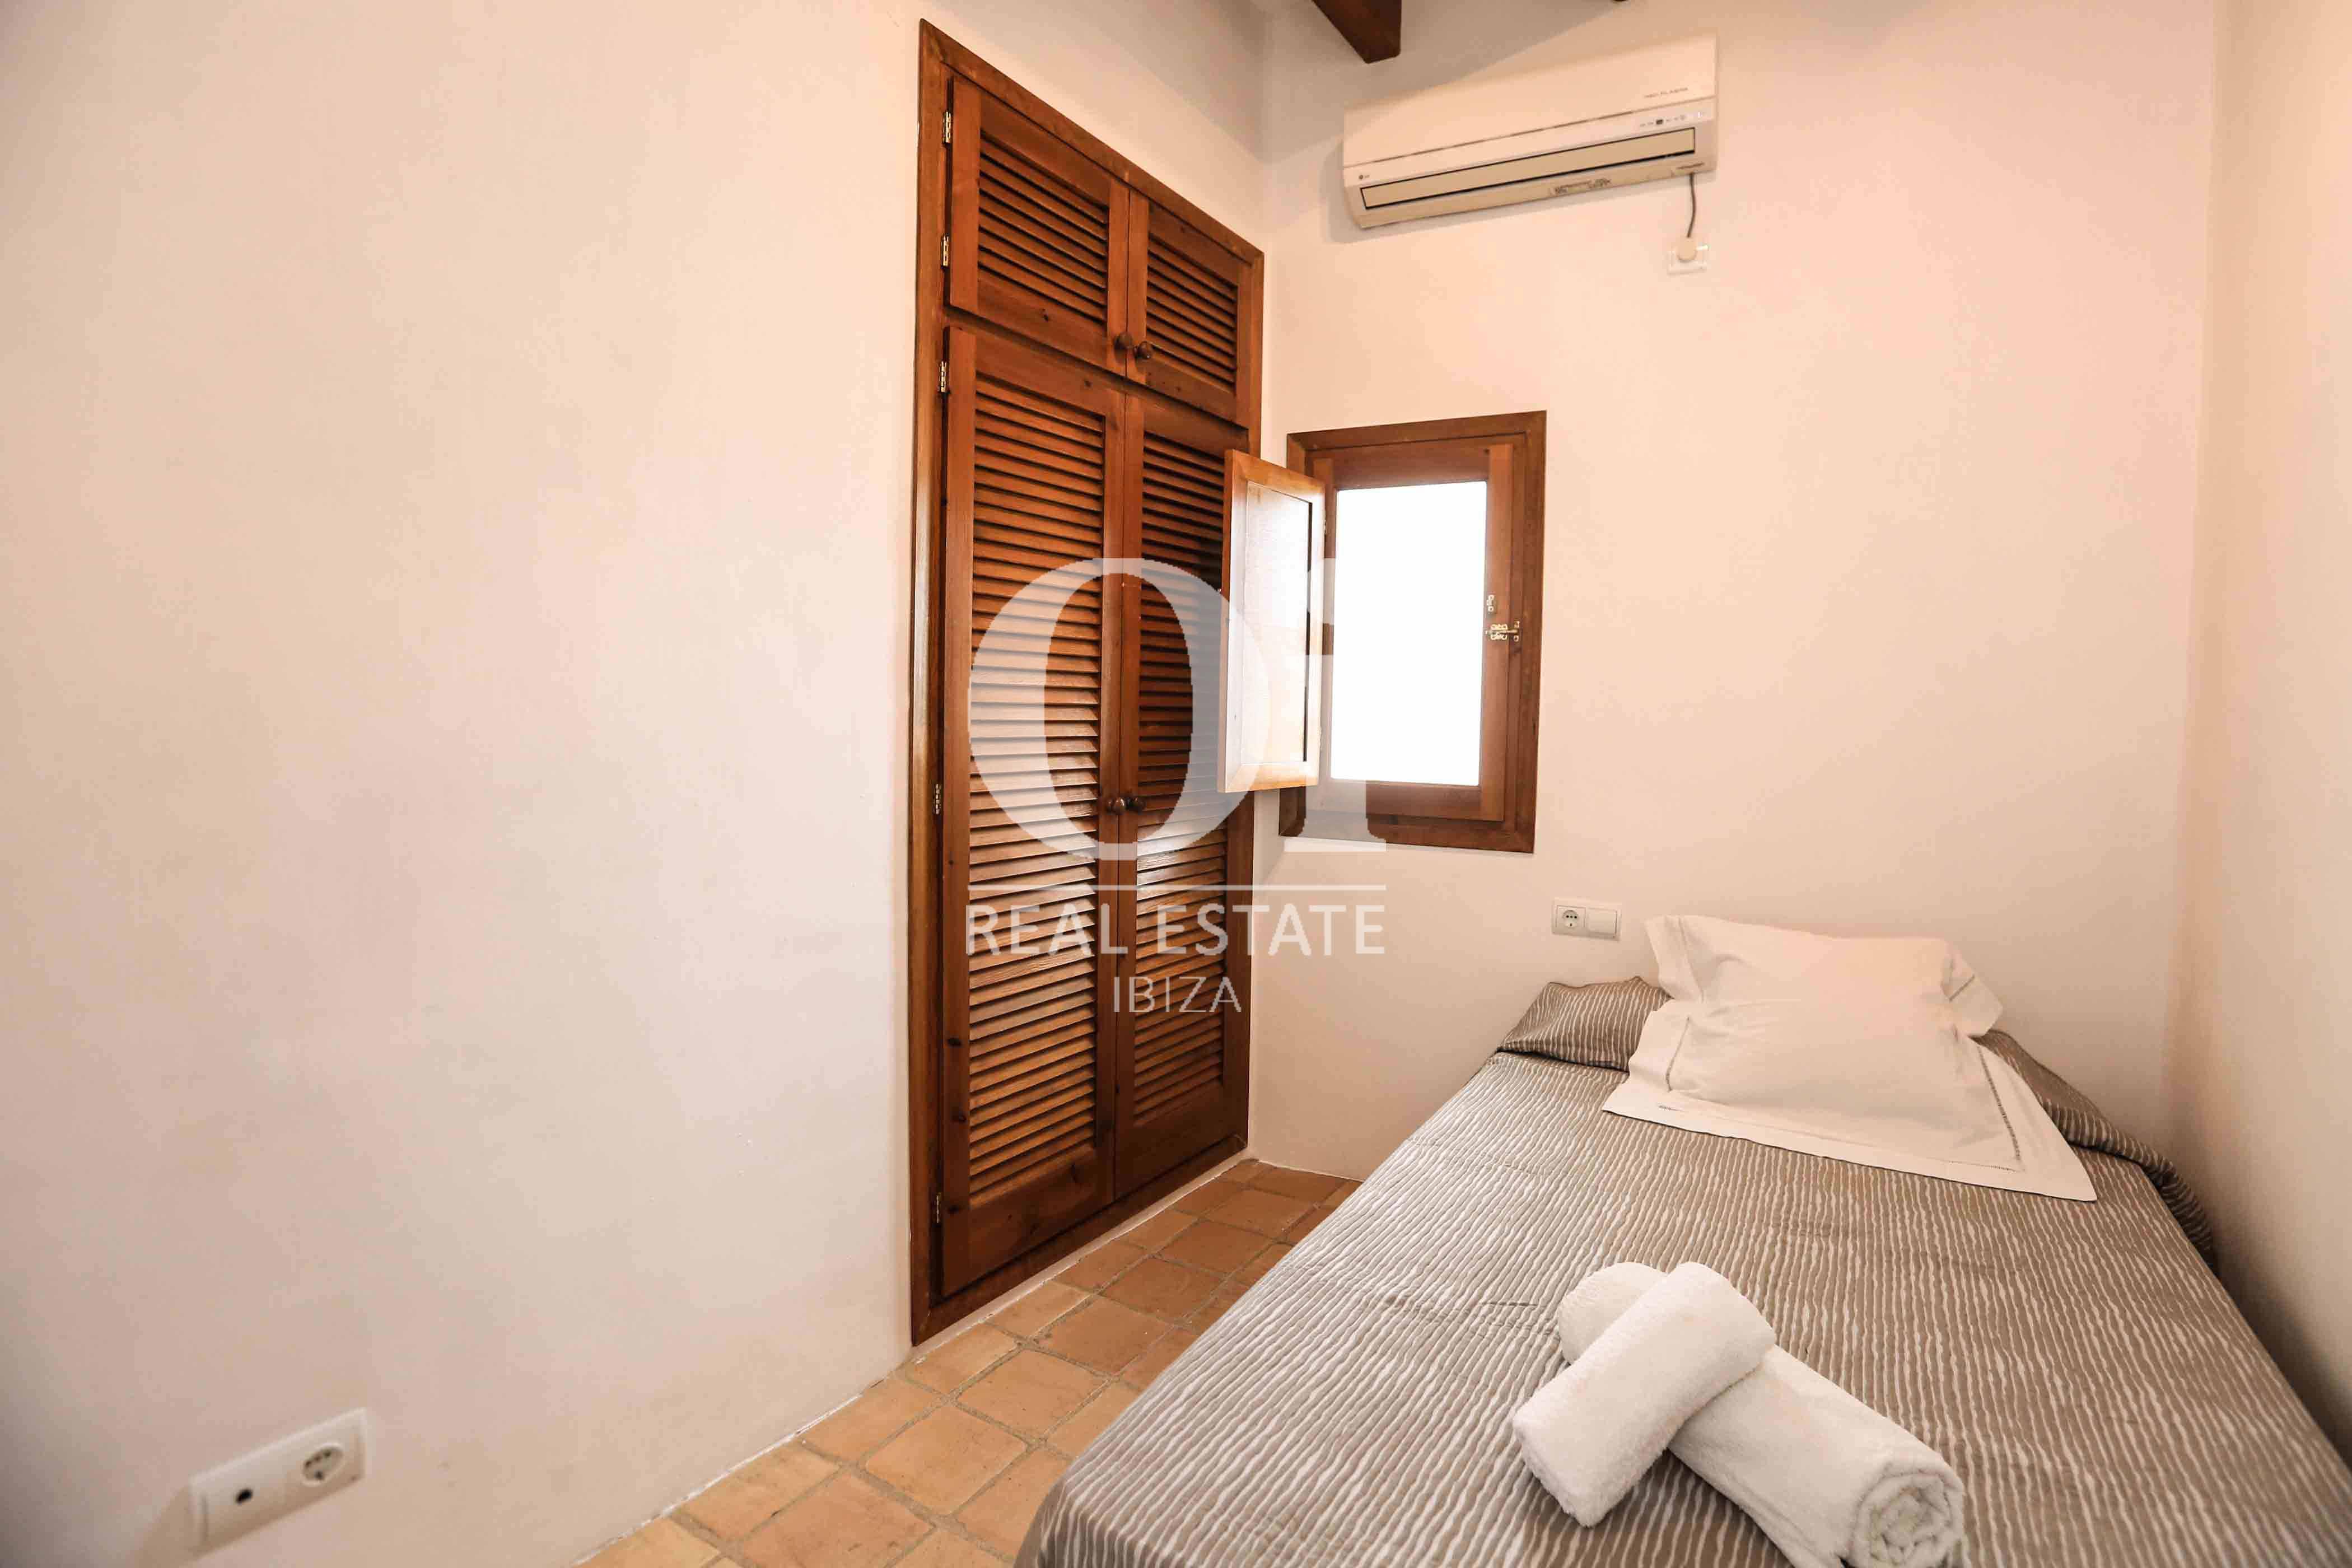 Chambre individuelle de villa de séjour à Puig d'en Valls, Ibiza